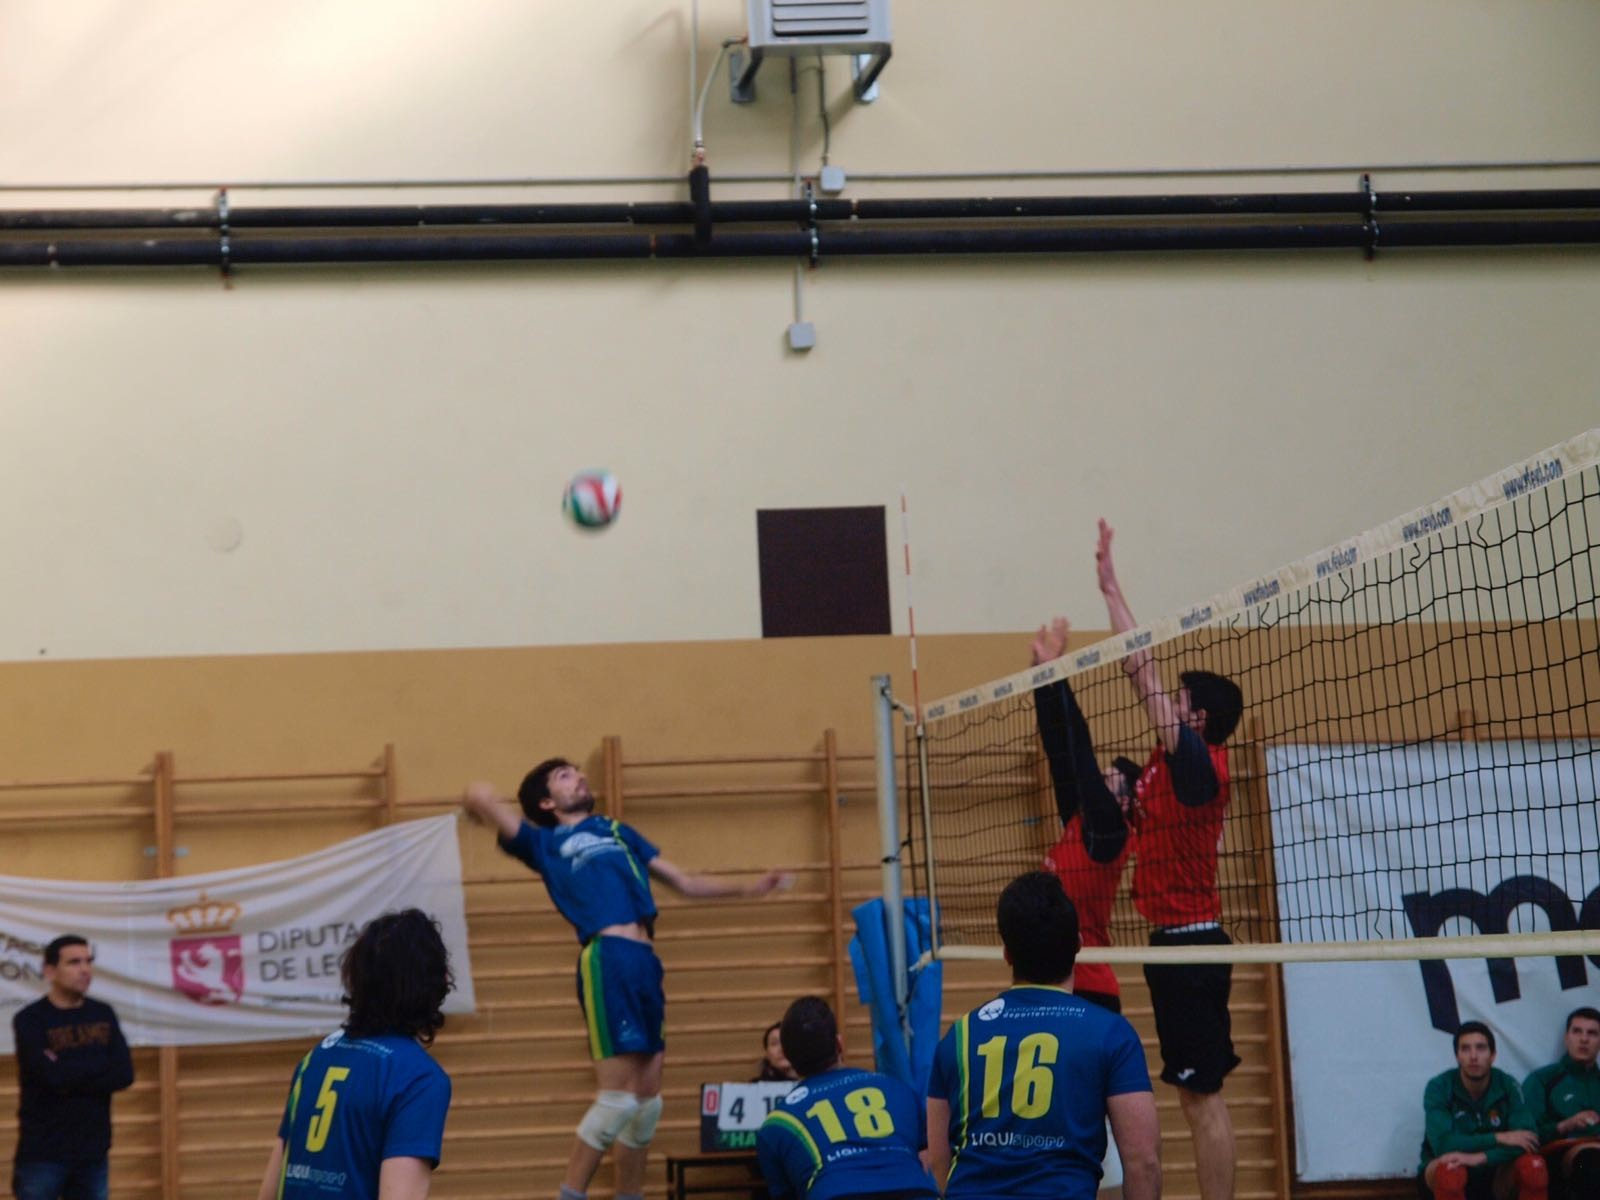 Crónica del Fin de Semana de Voleibol